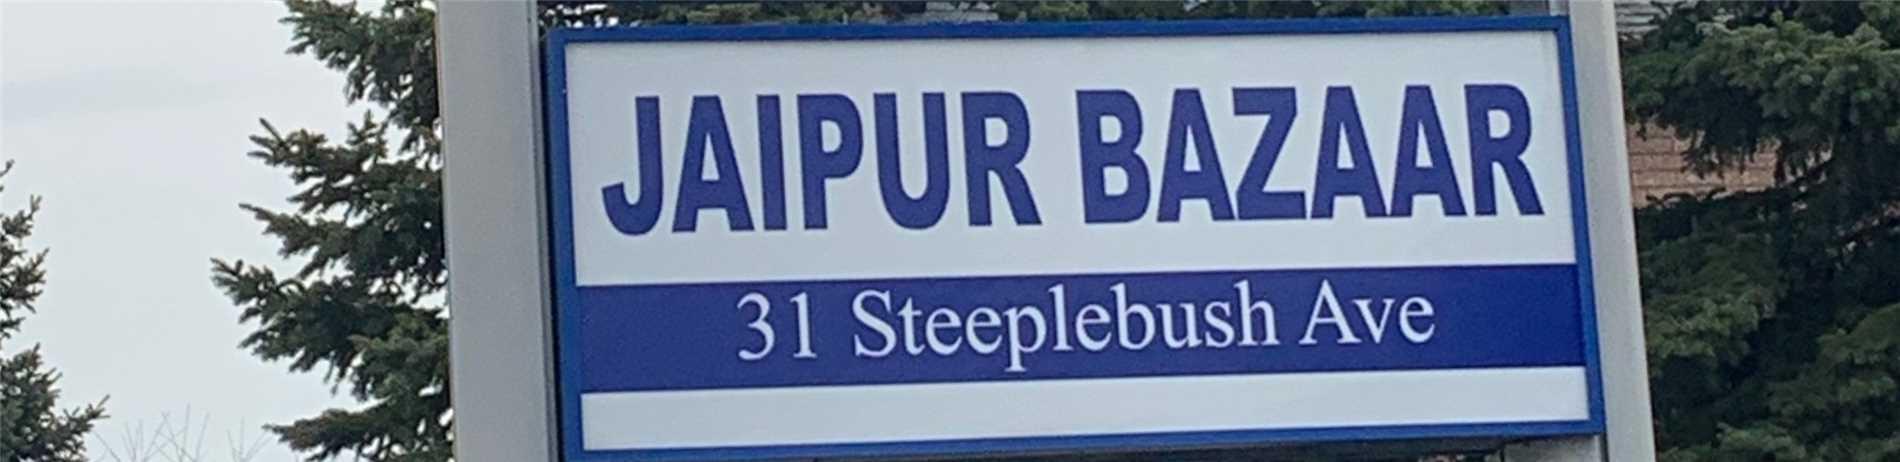 31 Steeplebush Ave